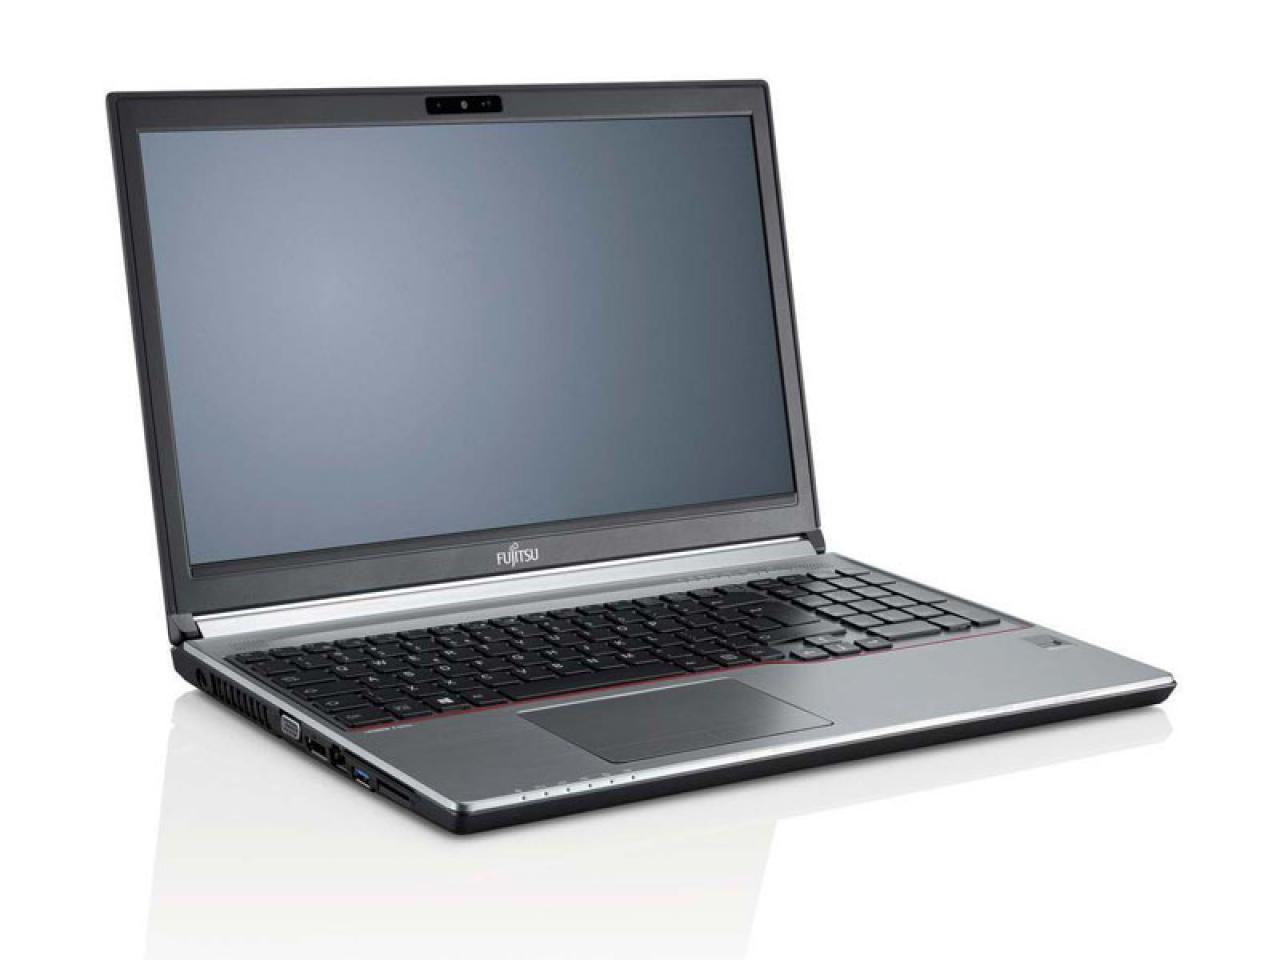 Fujitsu LIFEBOOK E754 (schwarze Tastatur)  - shop.bb-net.de